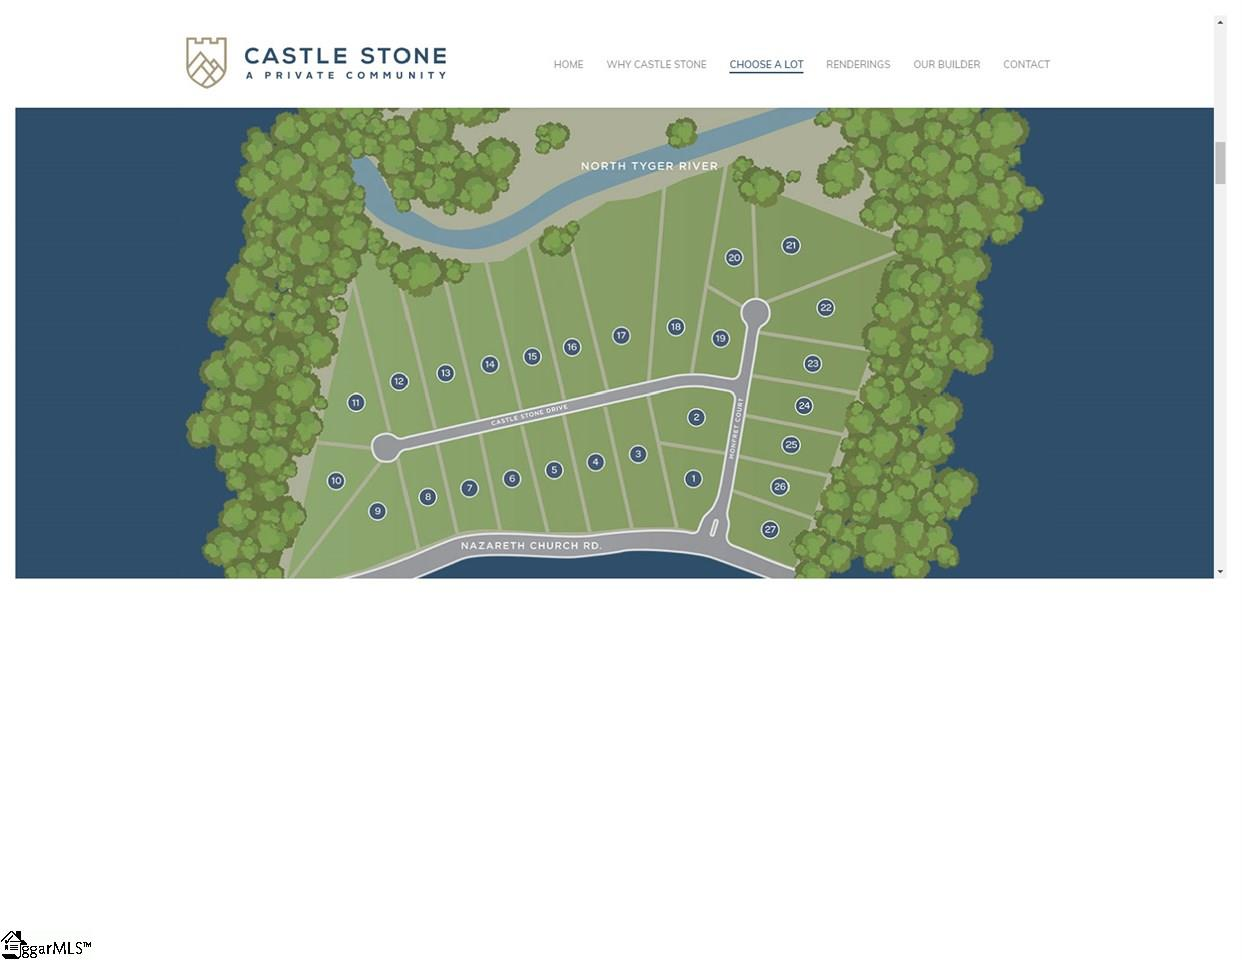 000 Castle Stone Moore, SC 29369